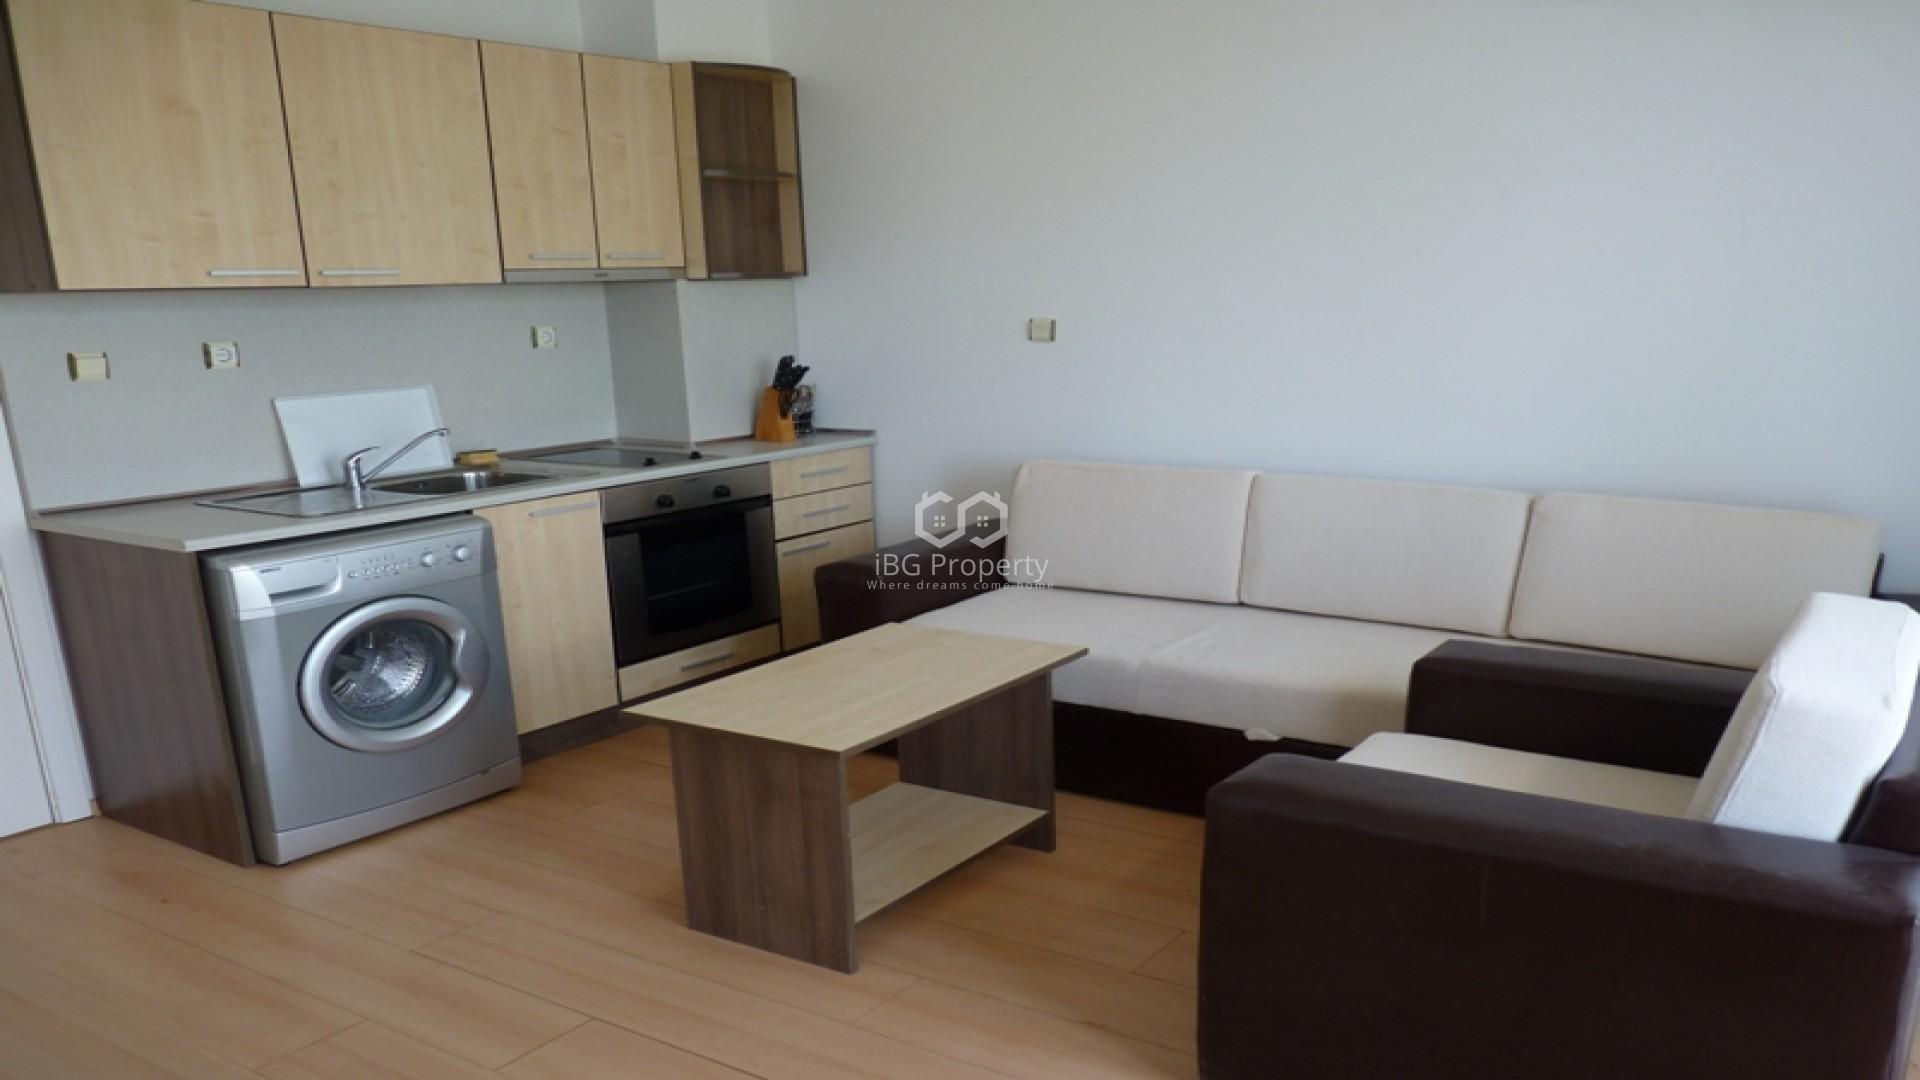 Eдностаен апартамент Слънчев Бряг 42 m2